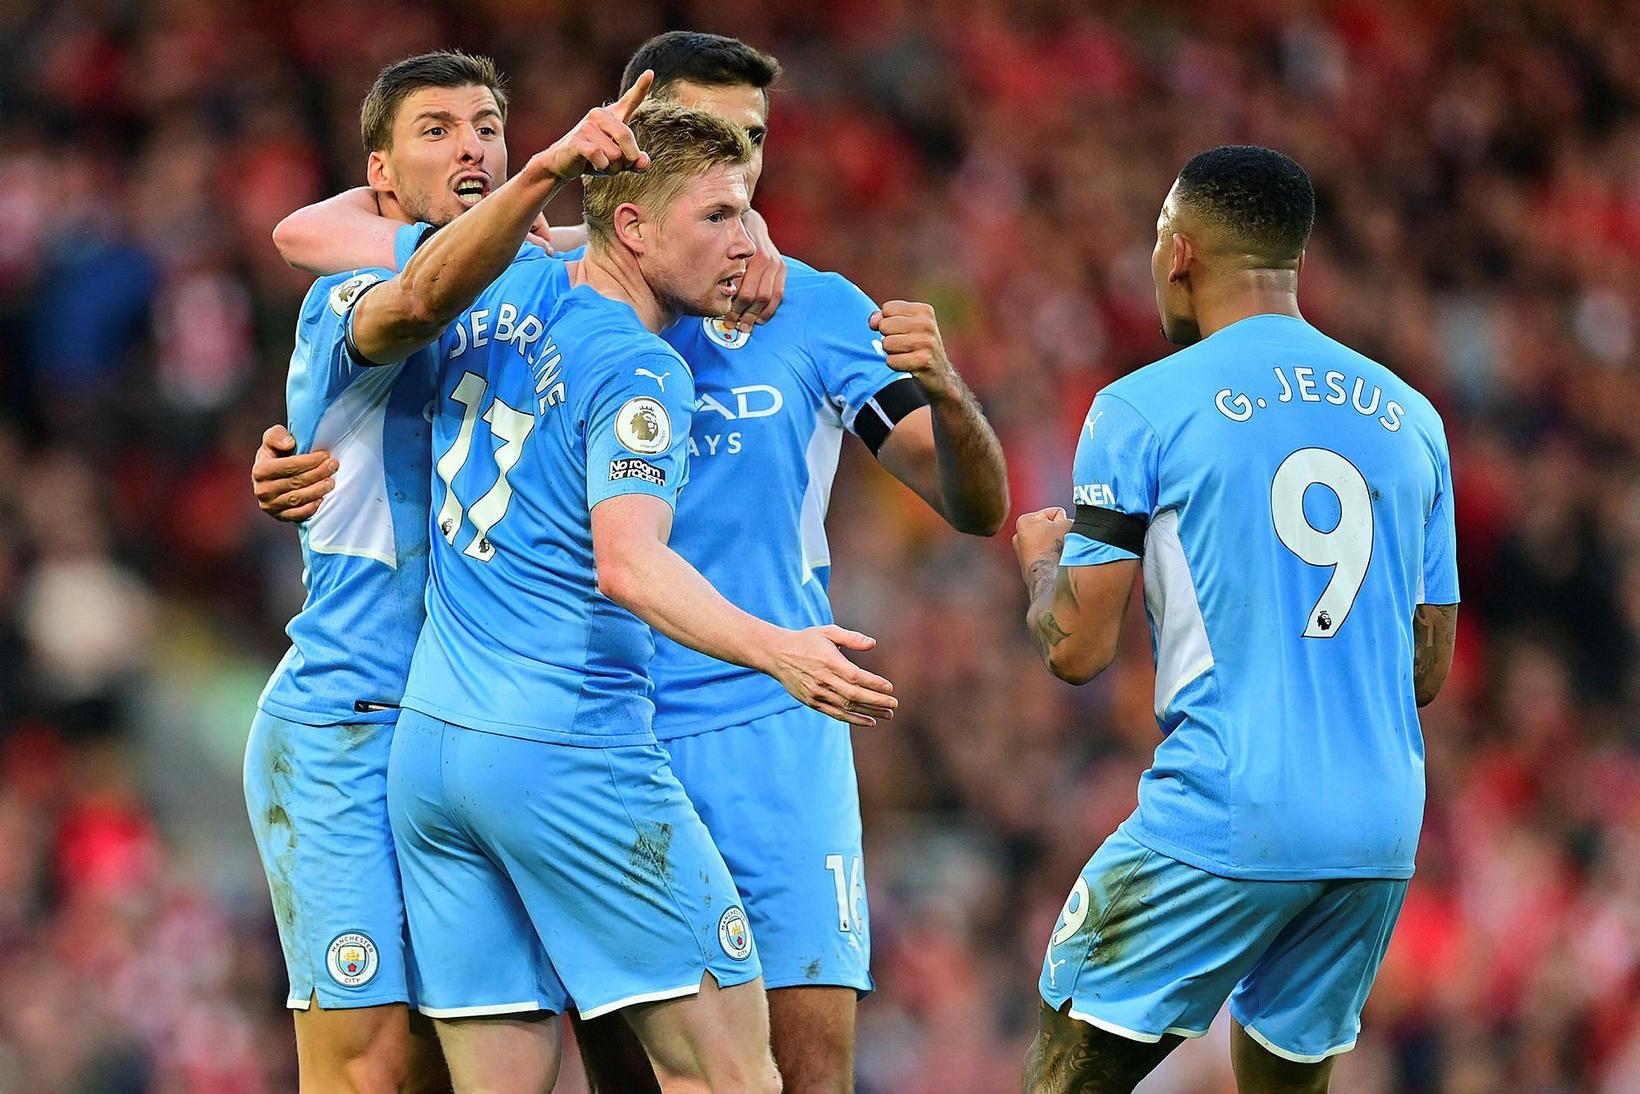 Leikmenn Manchester City fagna jöfnunarmarki Kevin De Bruyne.